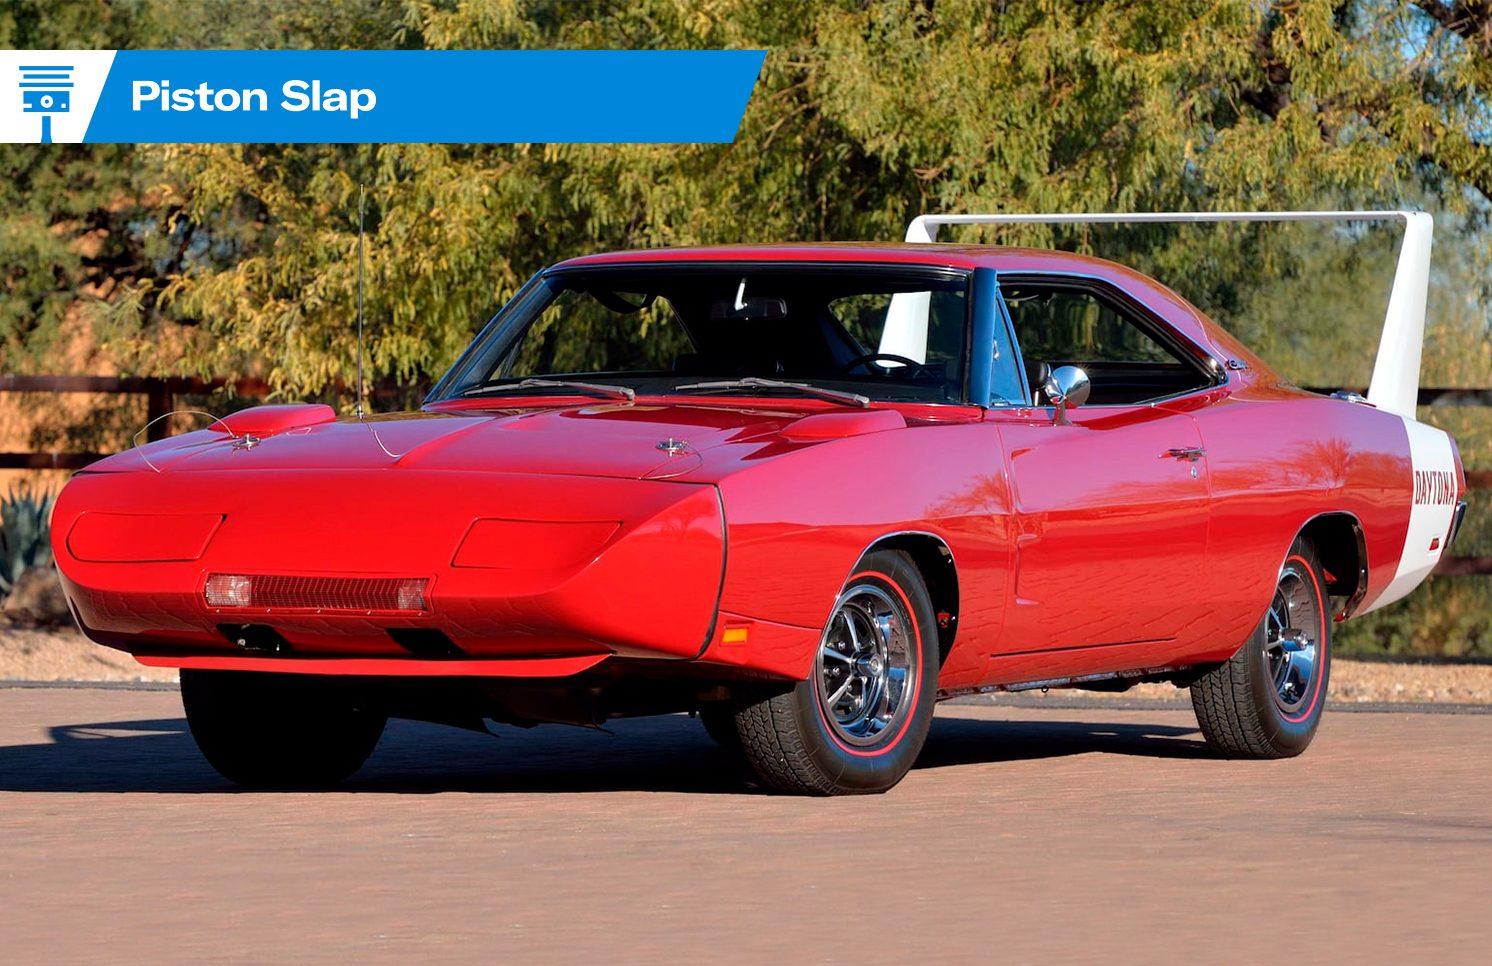 Piston-Slap-Daytona-Lede